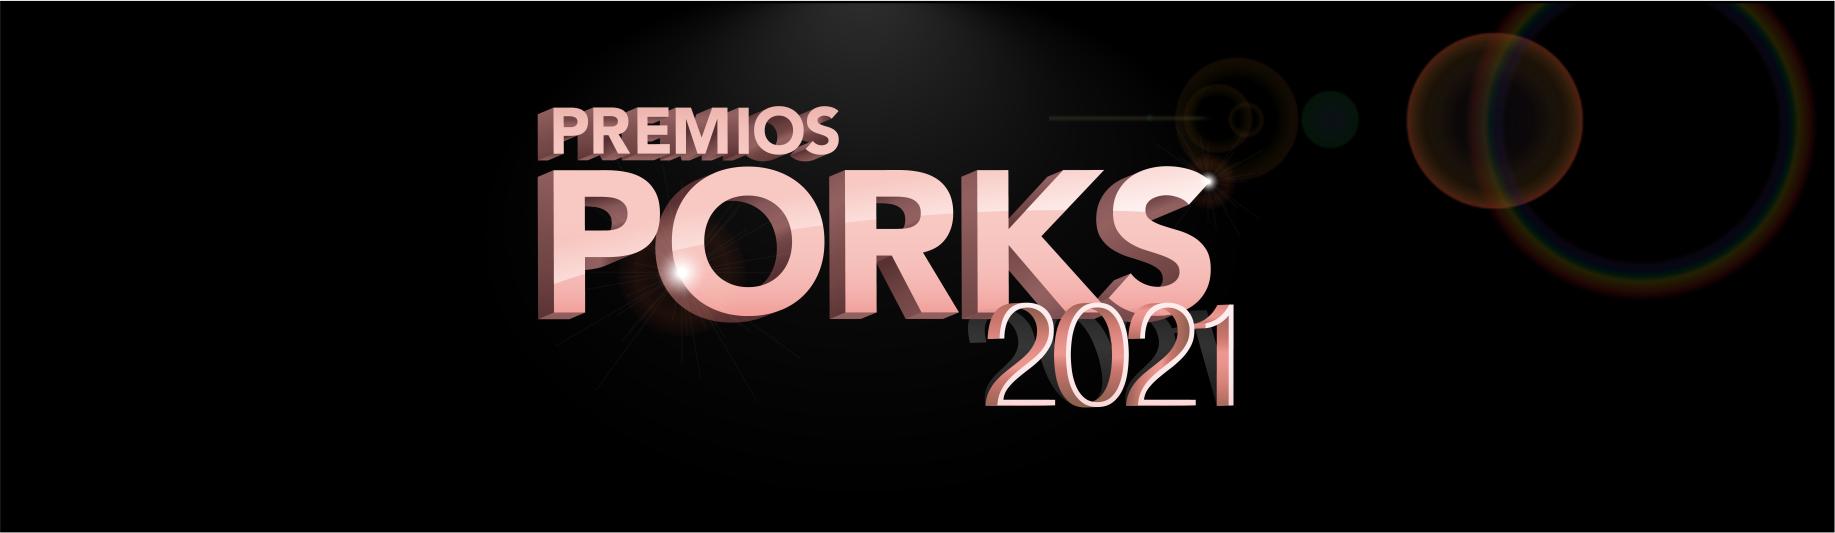 https://www.porkcolombia.co/wp-content/uploads/2021/06/Premios-Porks-Porkcolombia.png